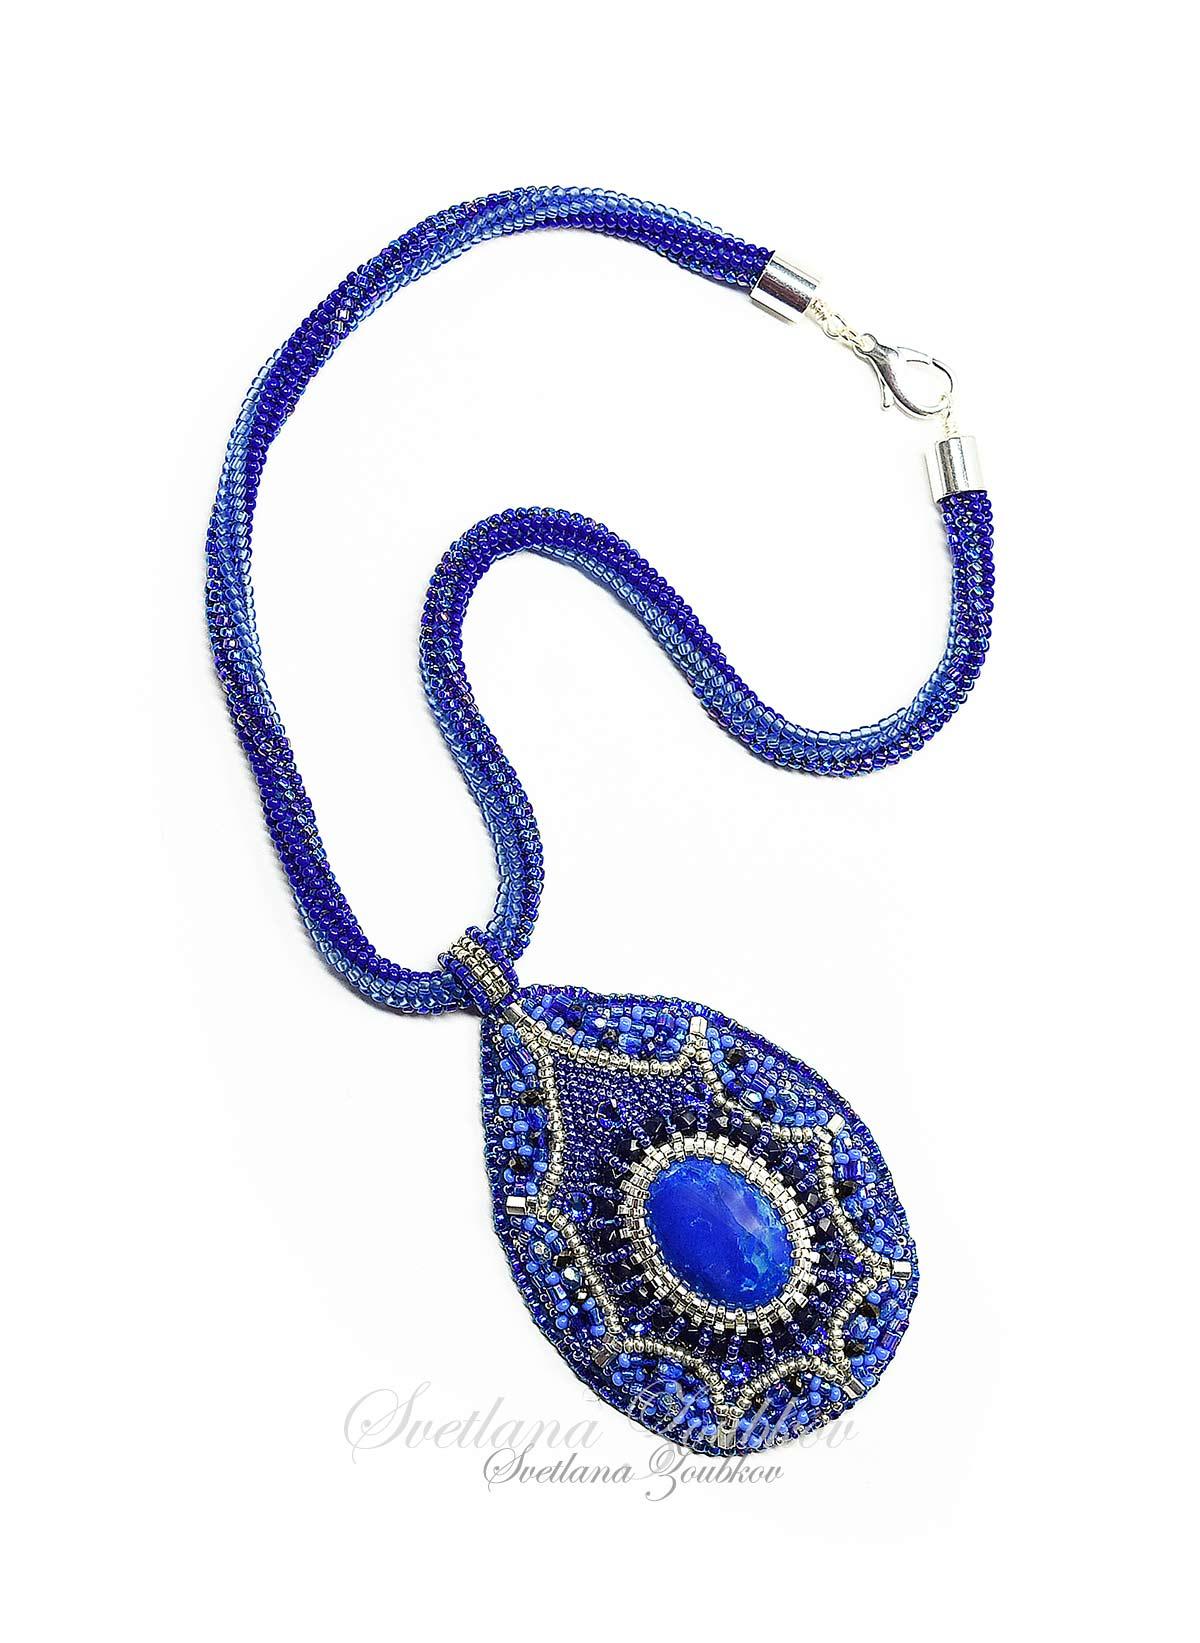 Welcome to Svetlana.Gallery of Handmade Jewelry